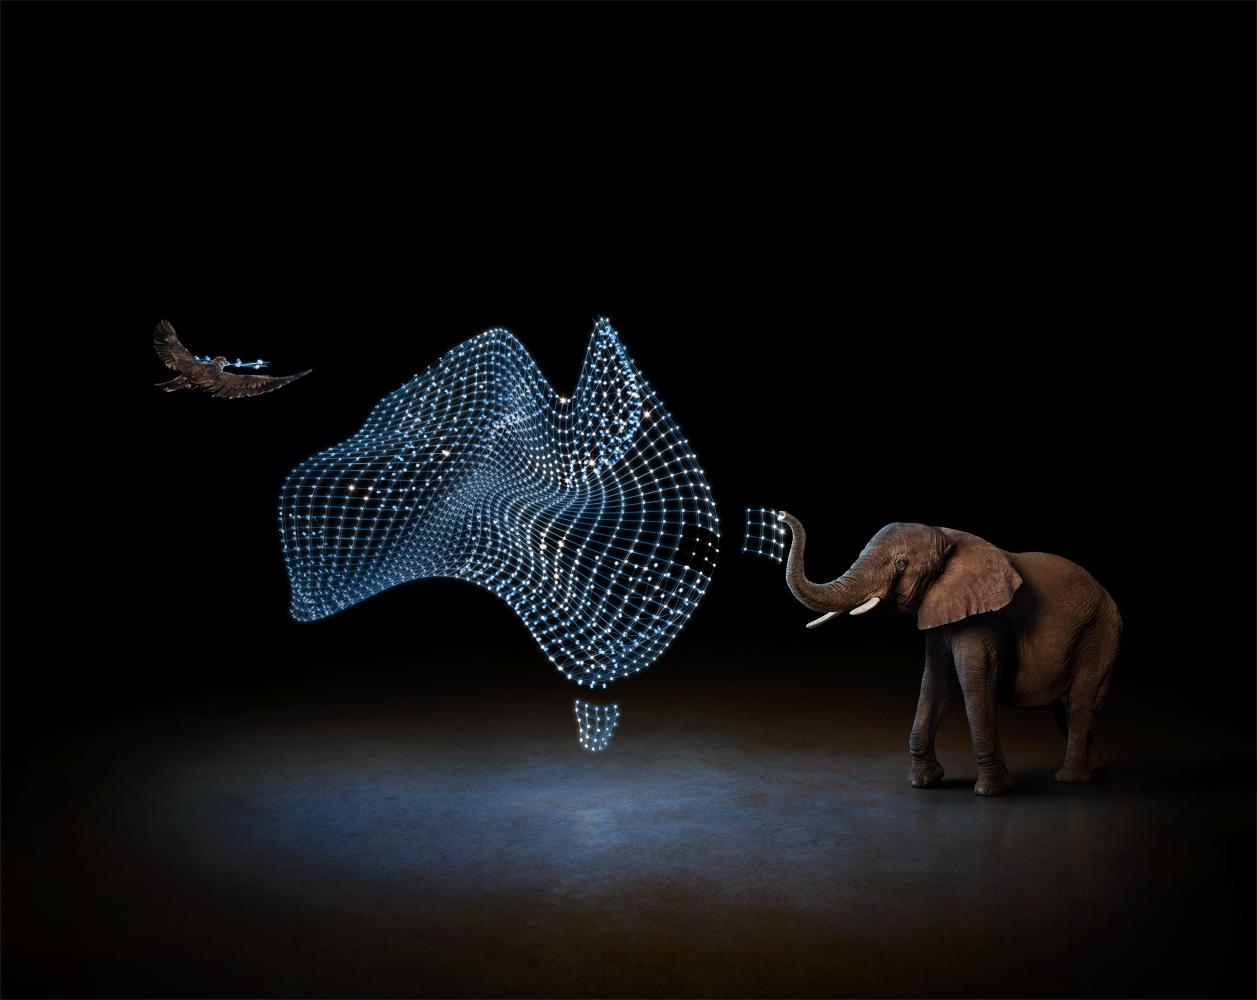 electric_art_optus-light-map-elephant_sdw.jpg